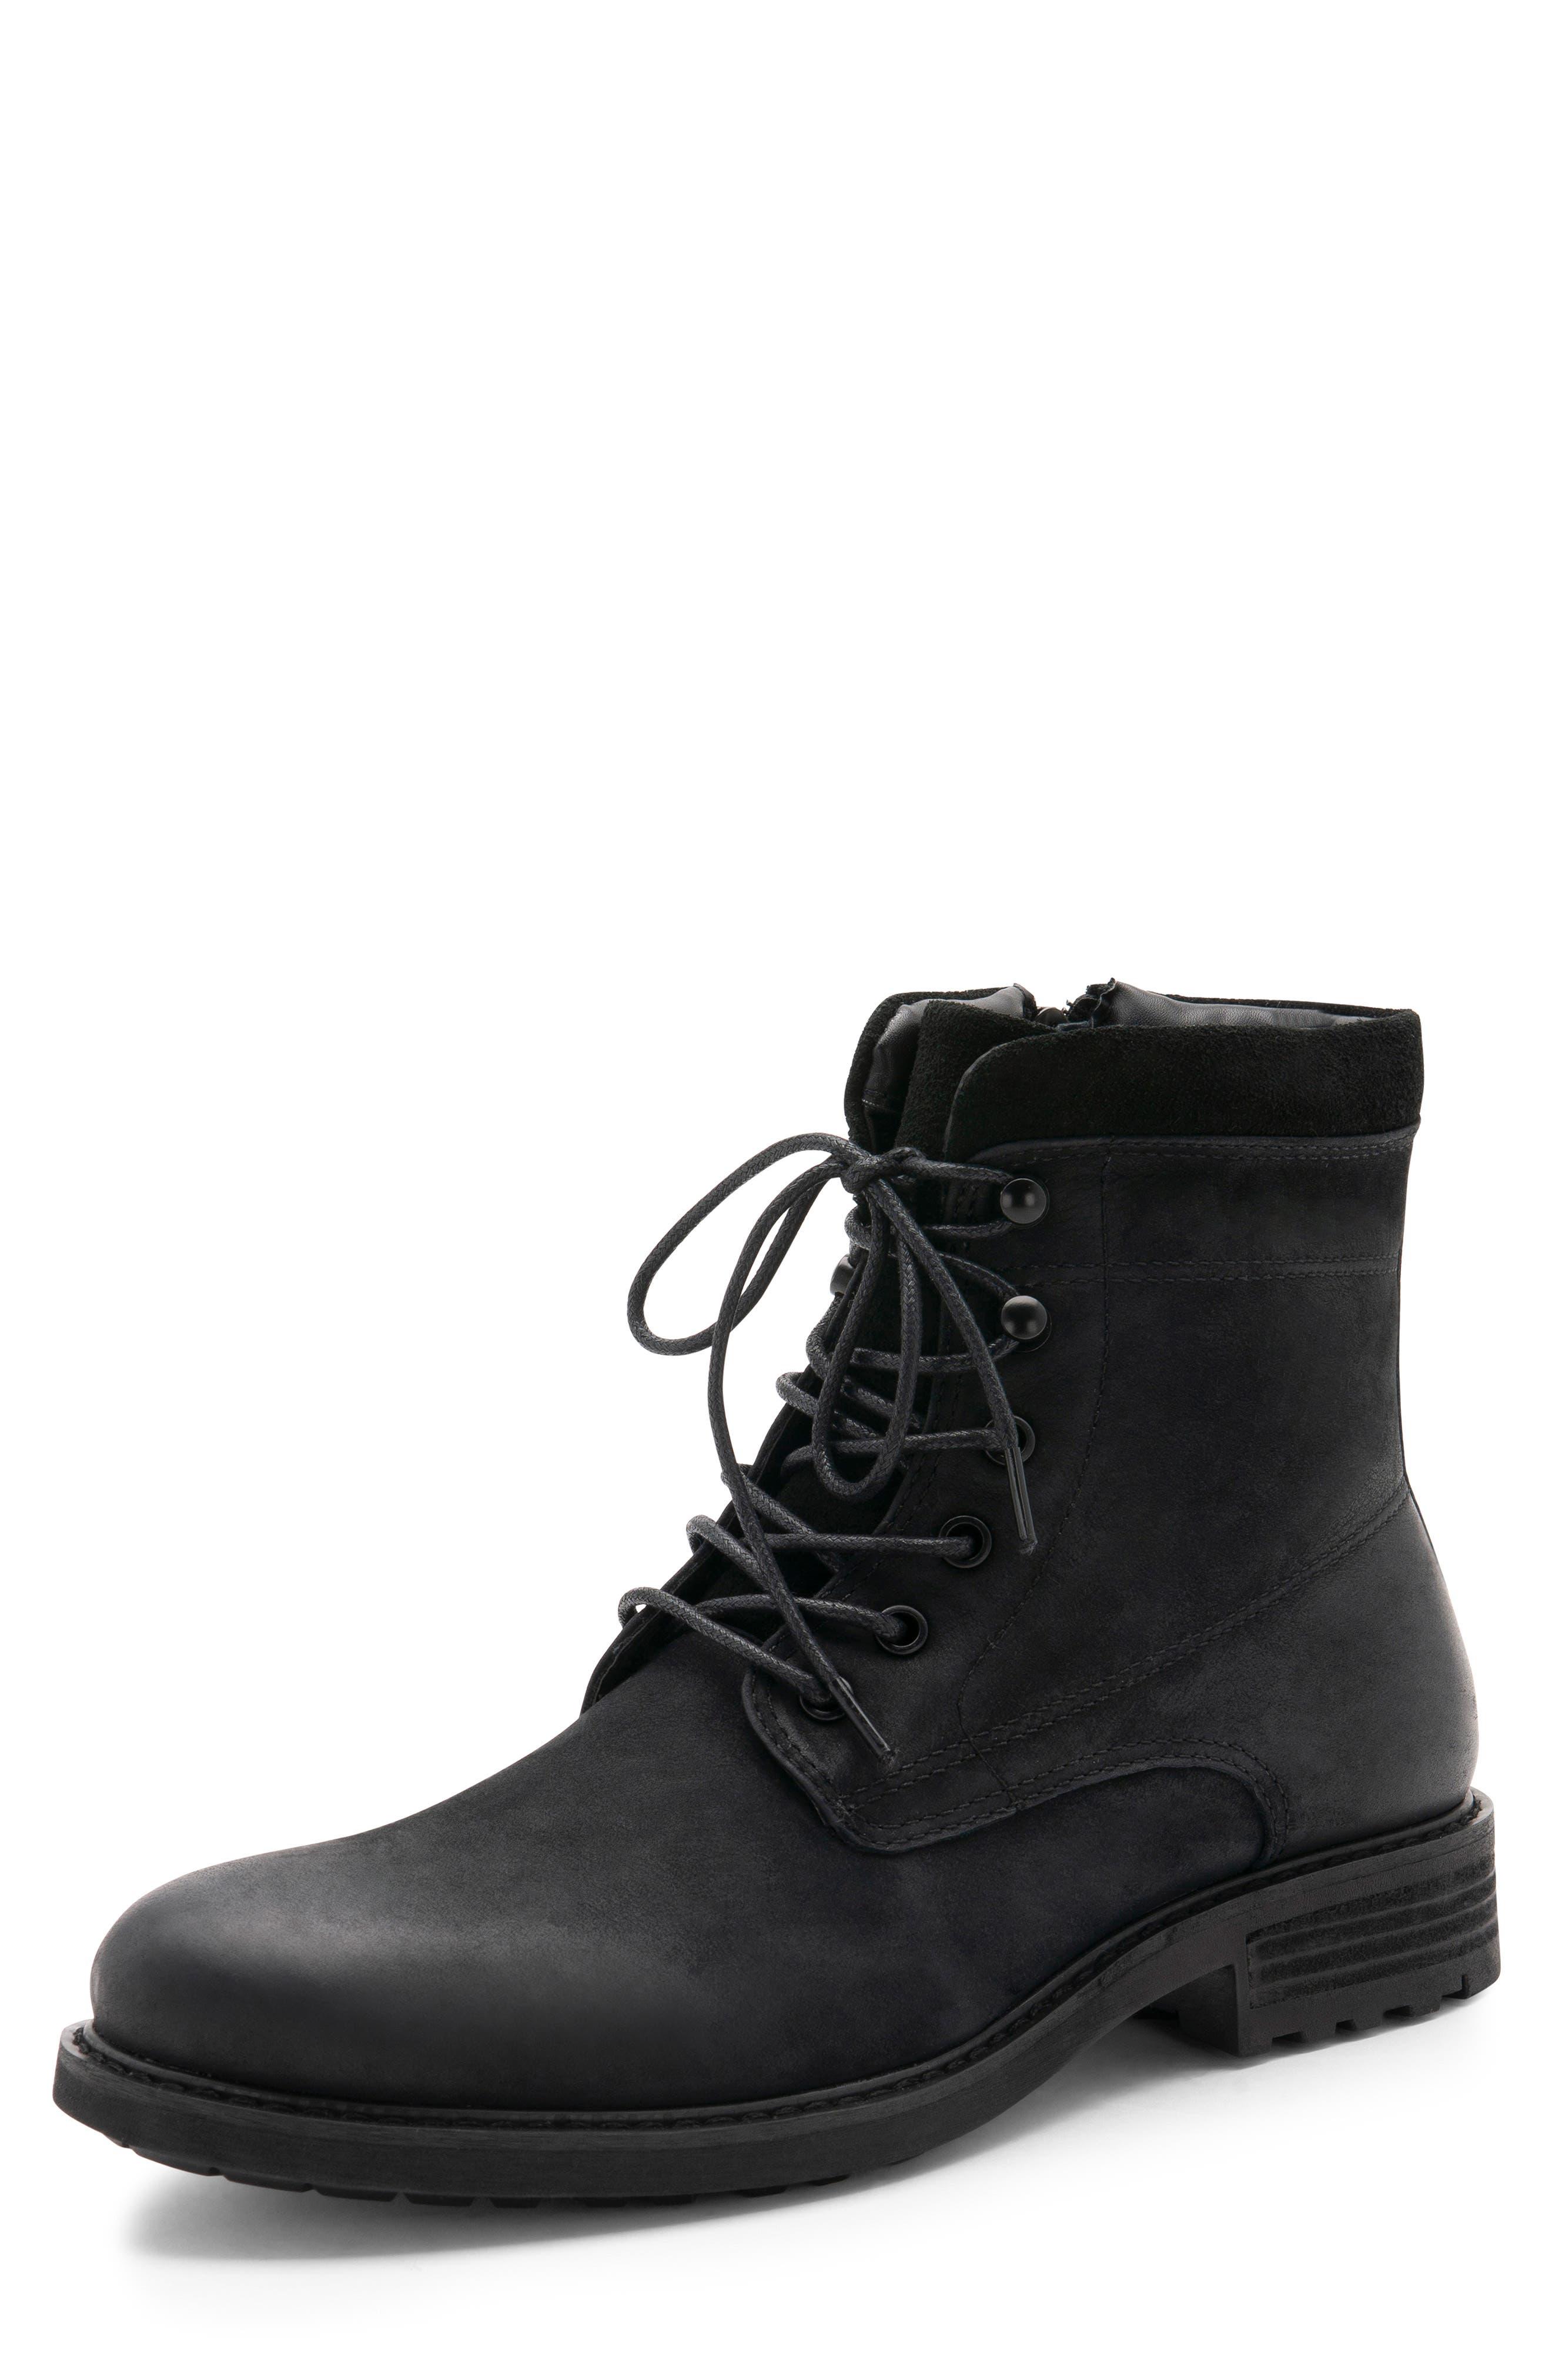 Patton Waterproof Plain Toe Boot,                             Alternate thumbnail 7, color,                             BLACK NUBUCK